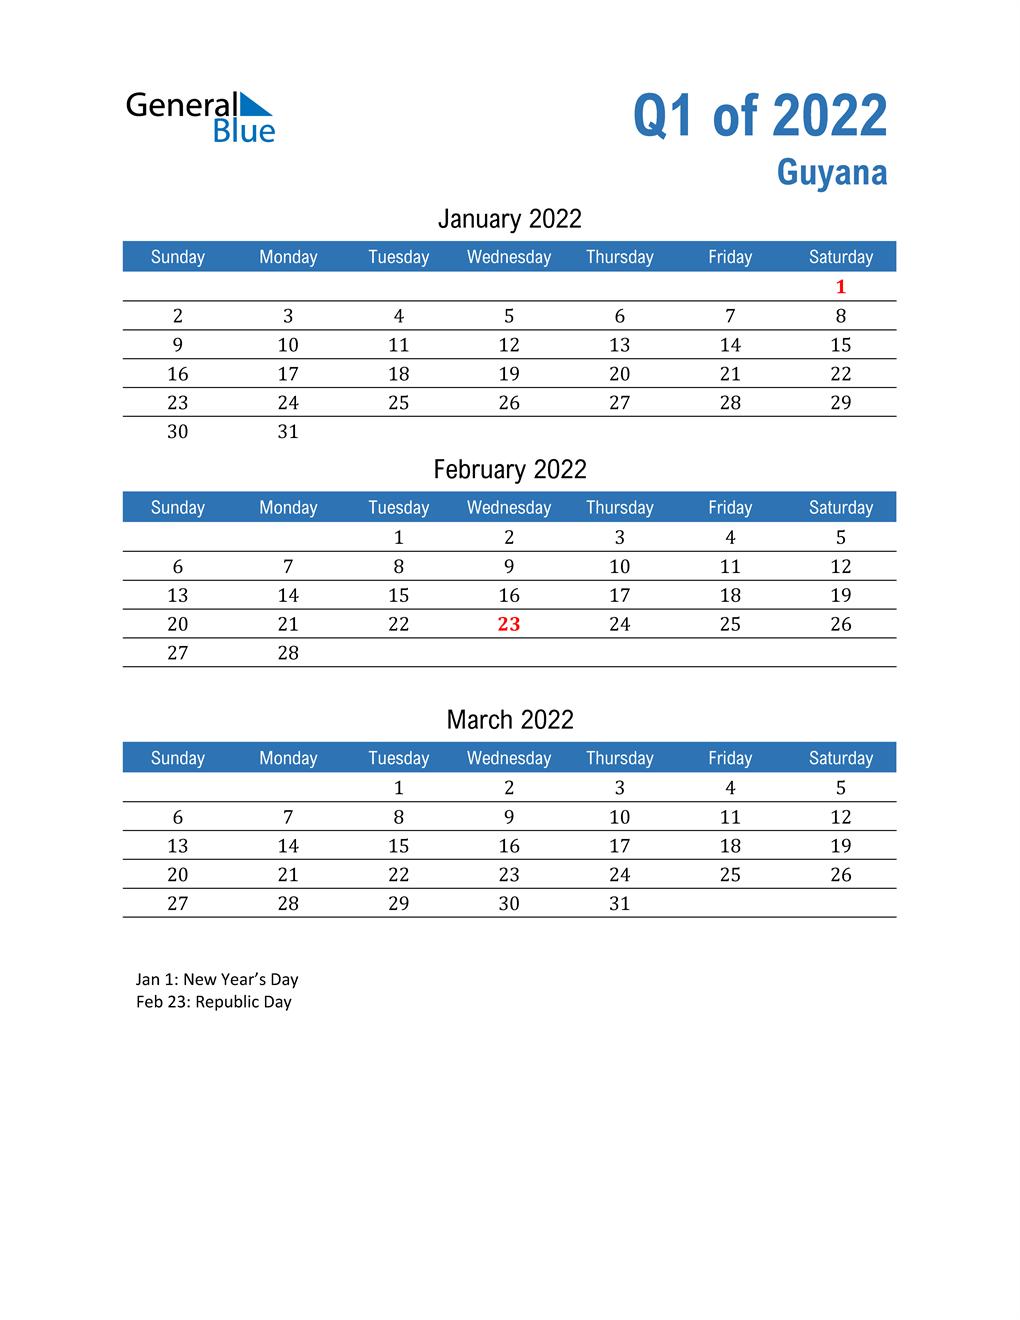 Guyana 2022 Quarterly Calendar